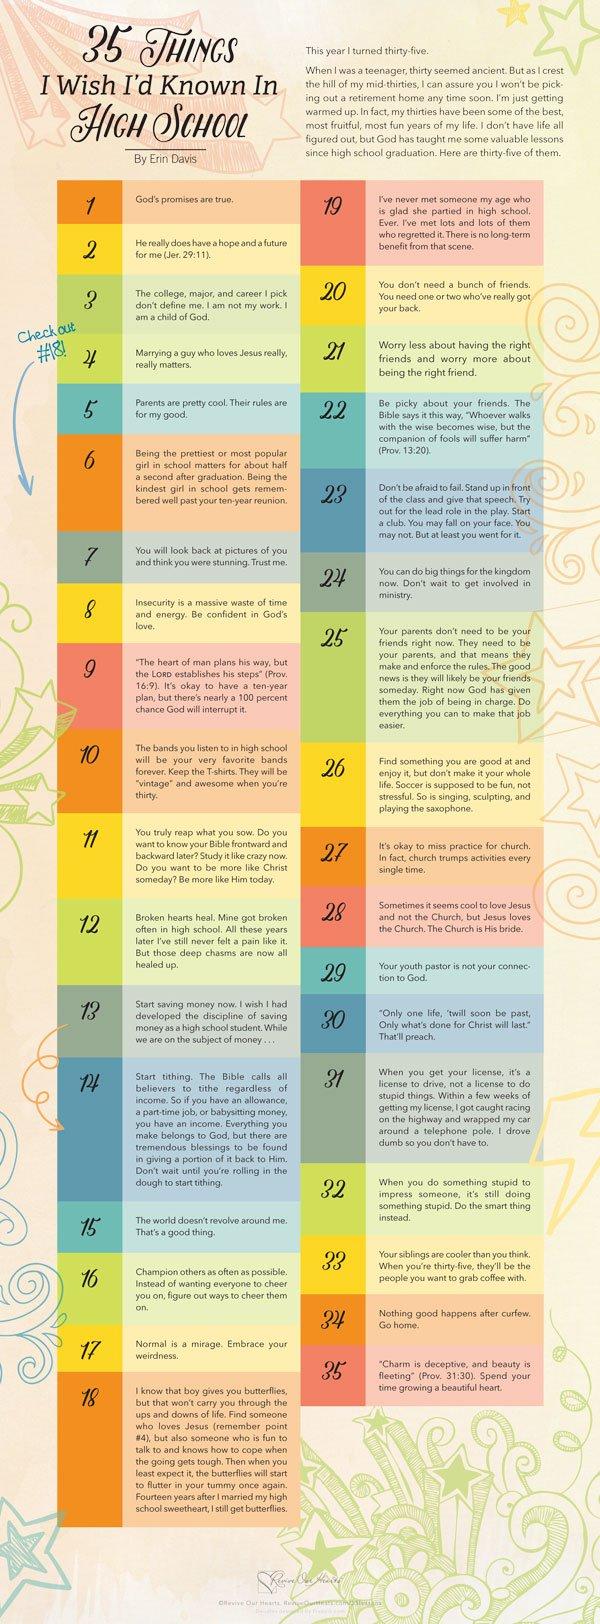 35 Lessons Locker Image